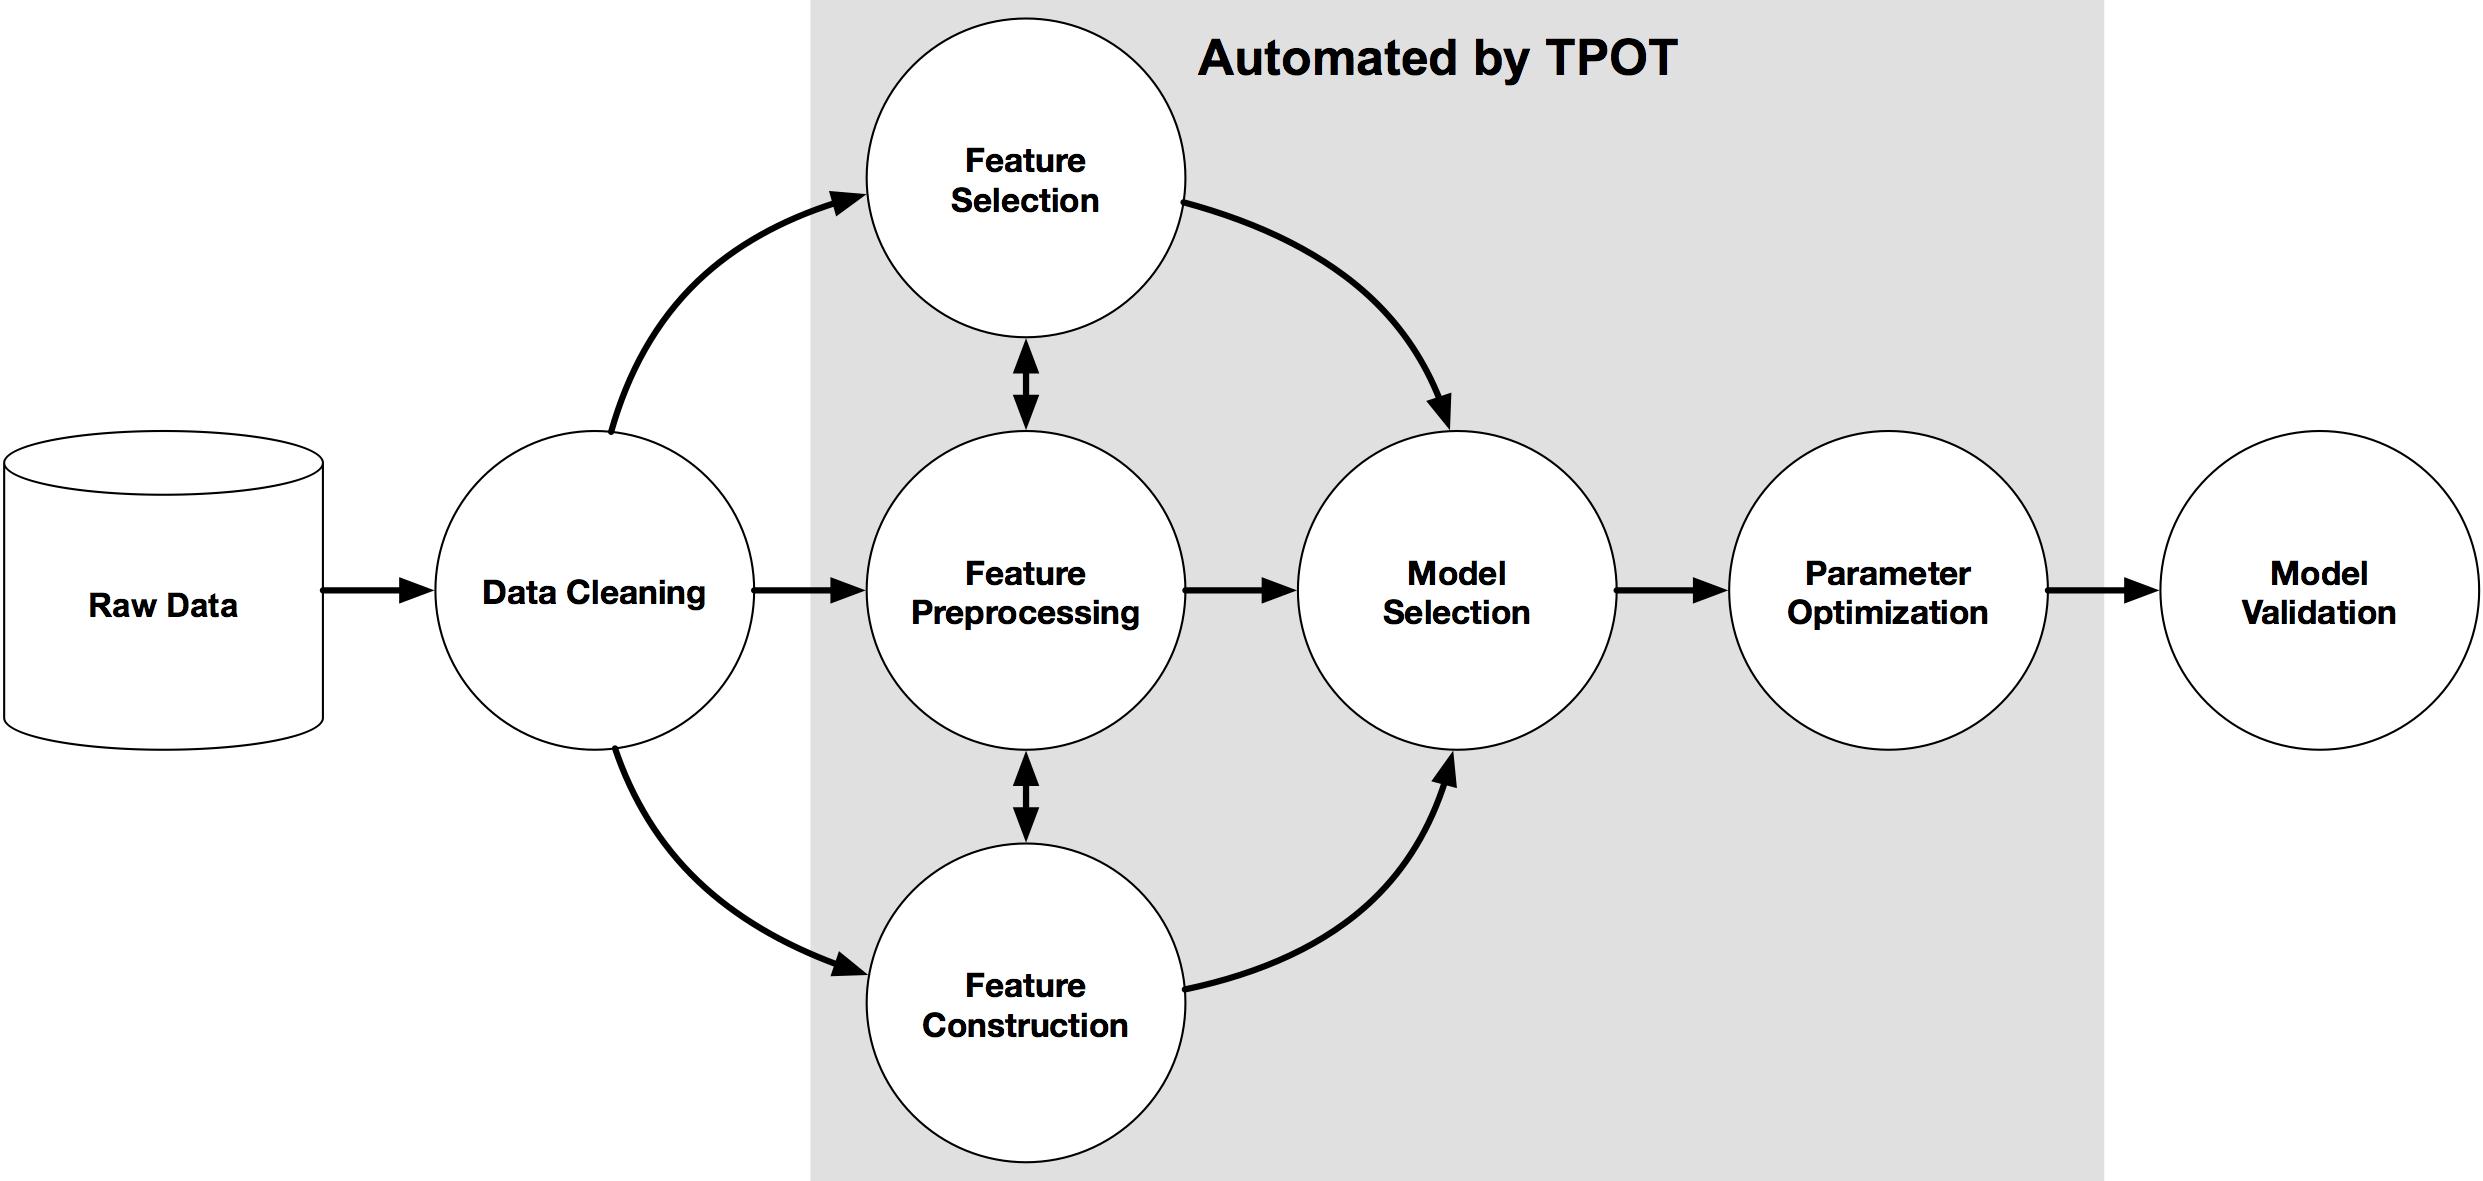 AutoML – using TPOT